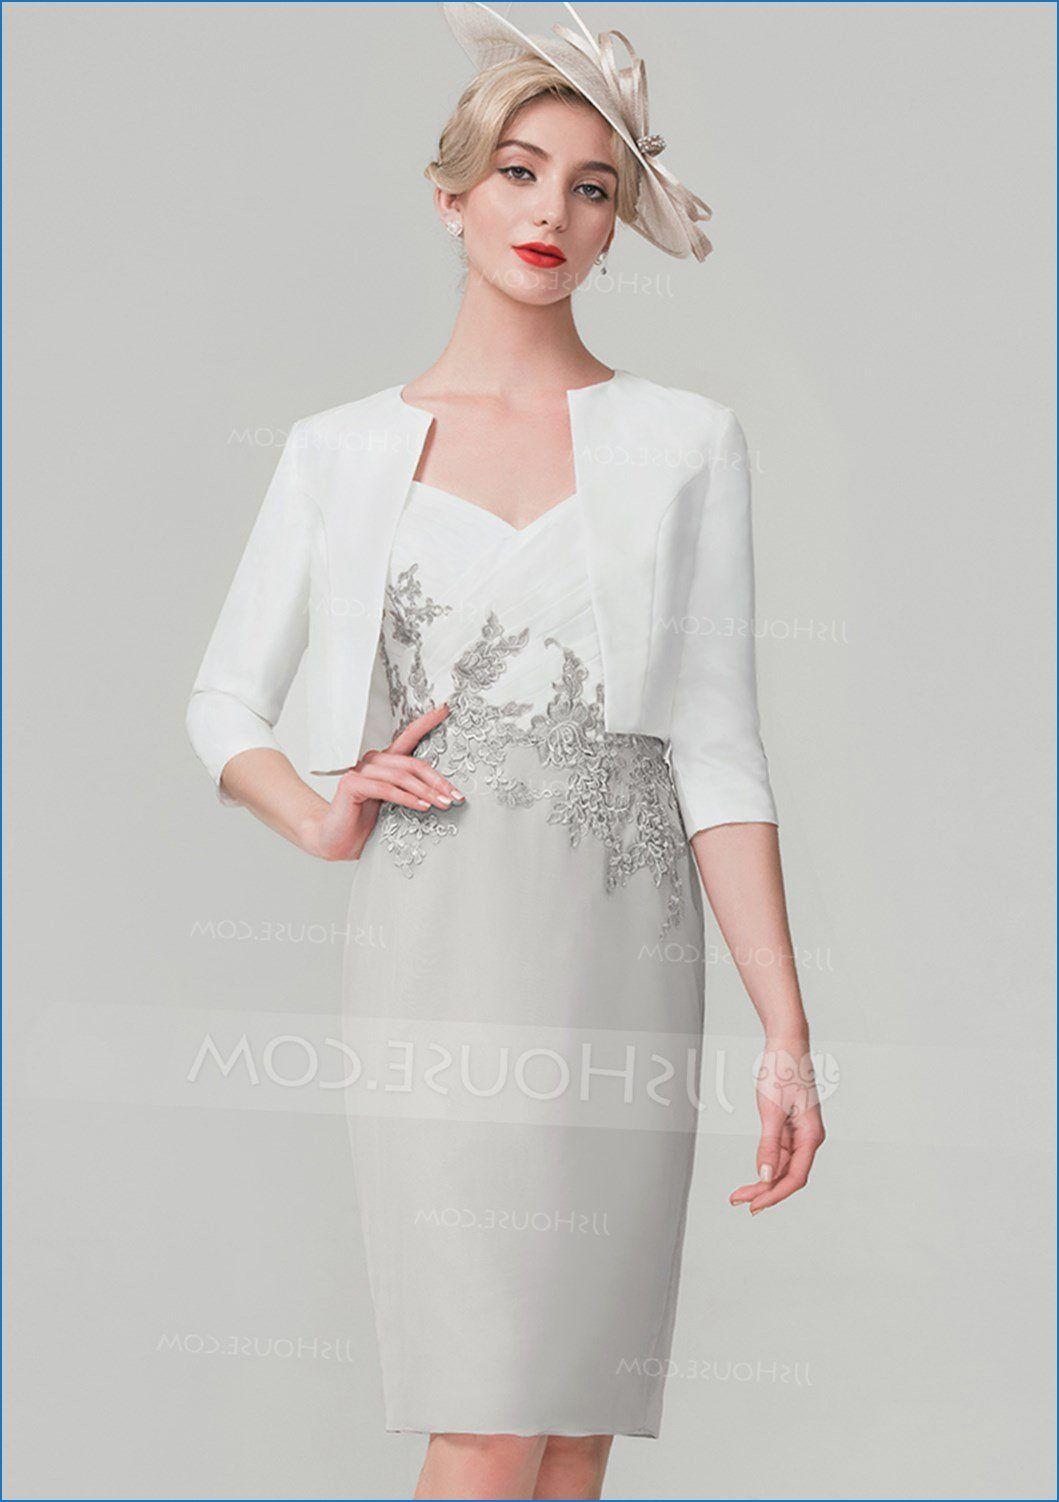 Kleid Brautmutter Wadenlang  Kleider mode, Kleider, Wadenlanges kleid